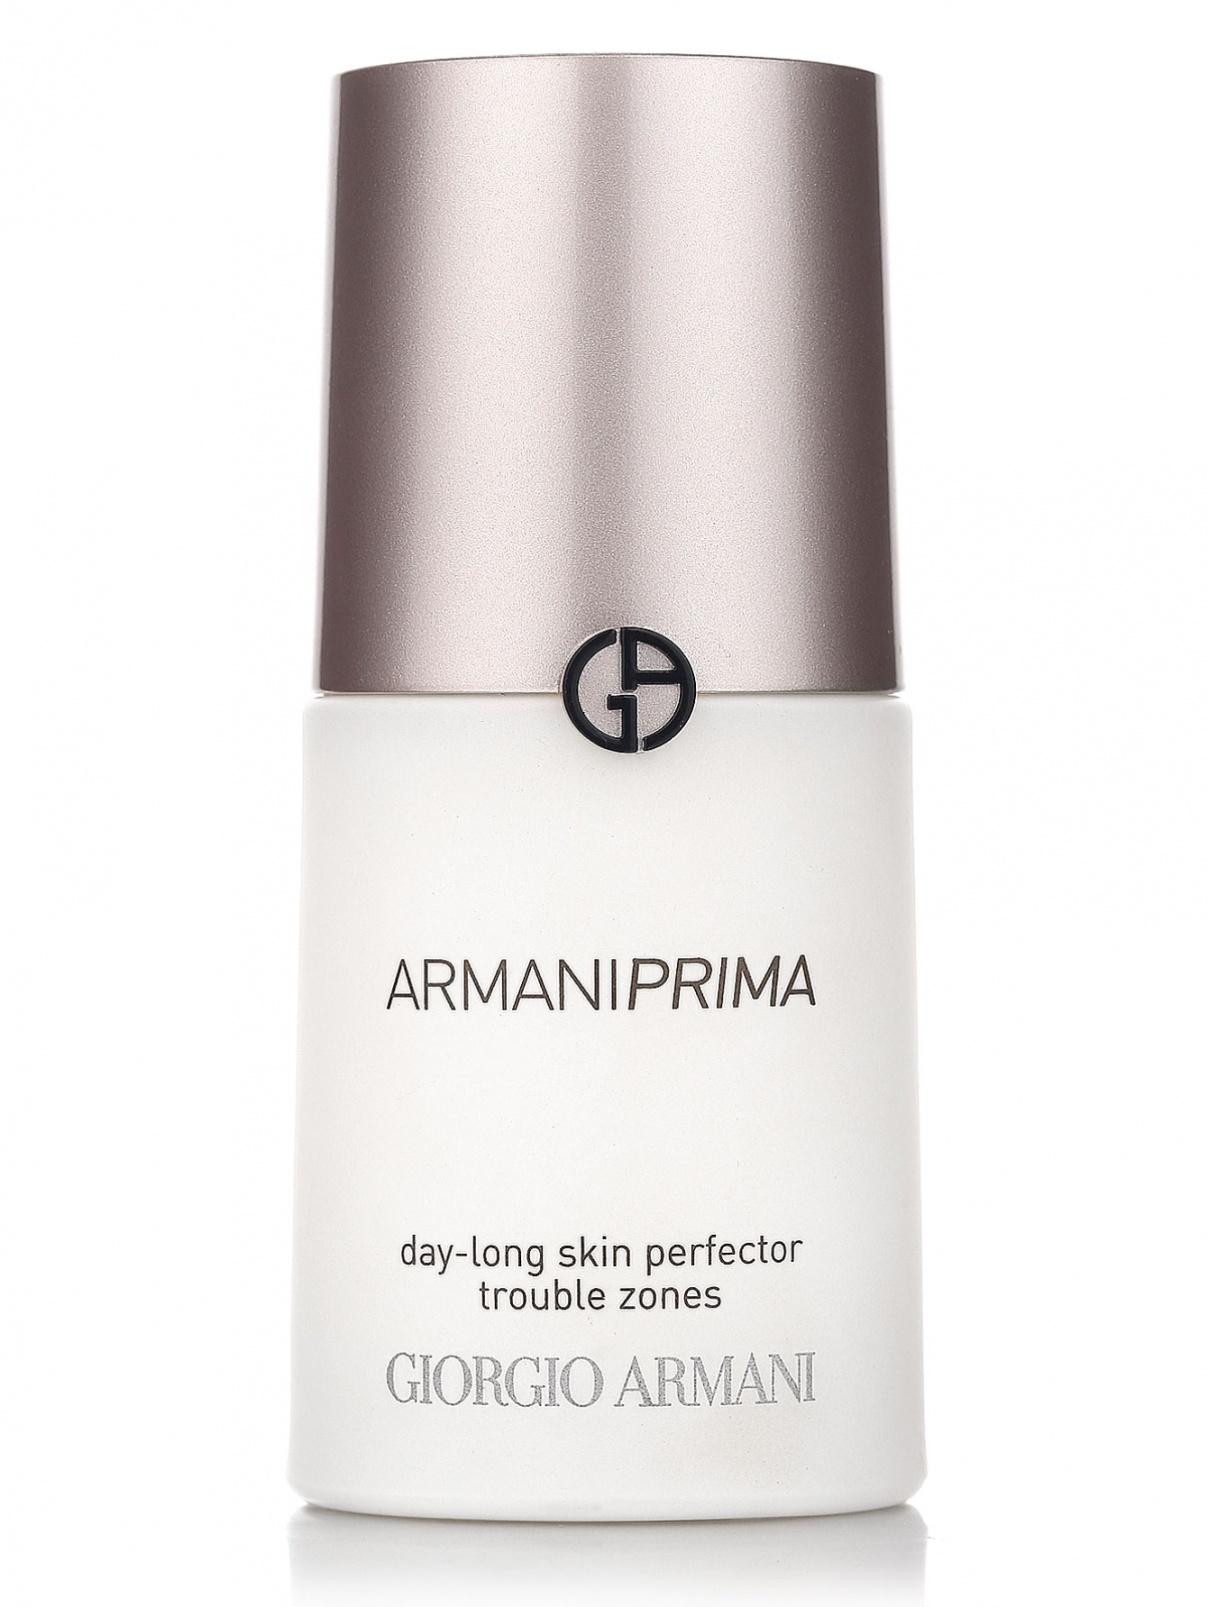 Основа под макияж - Armani Prima, 30ml Giorgio Armani  –  Общий вид